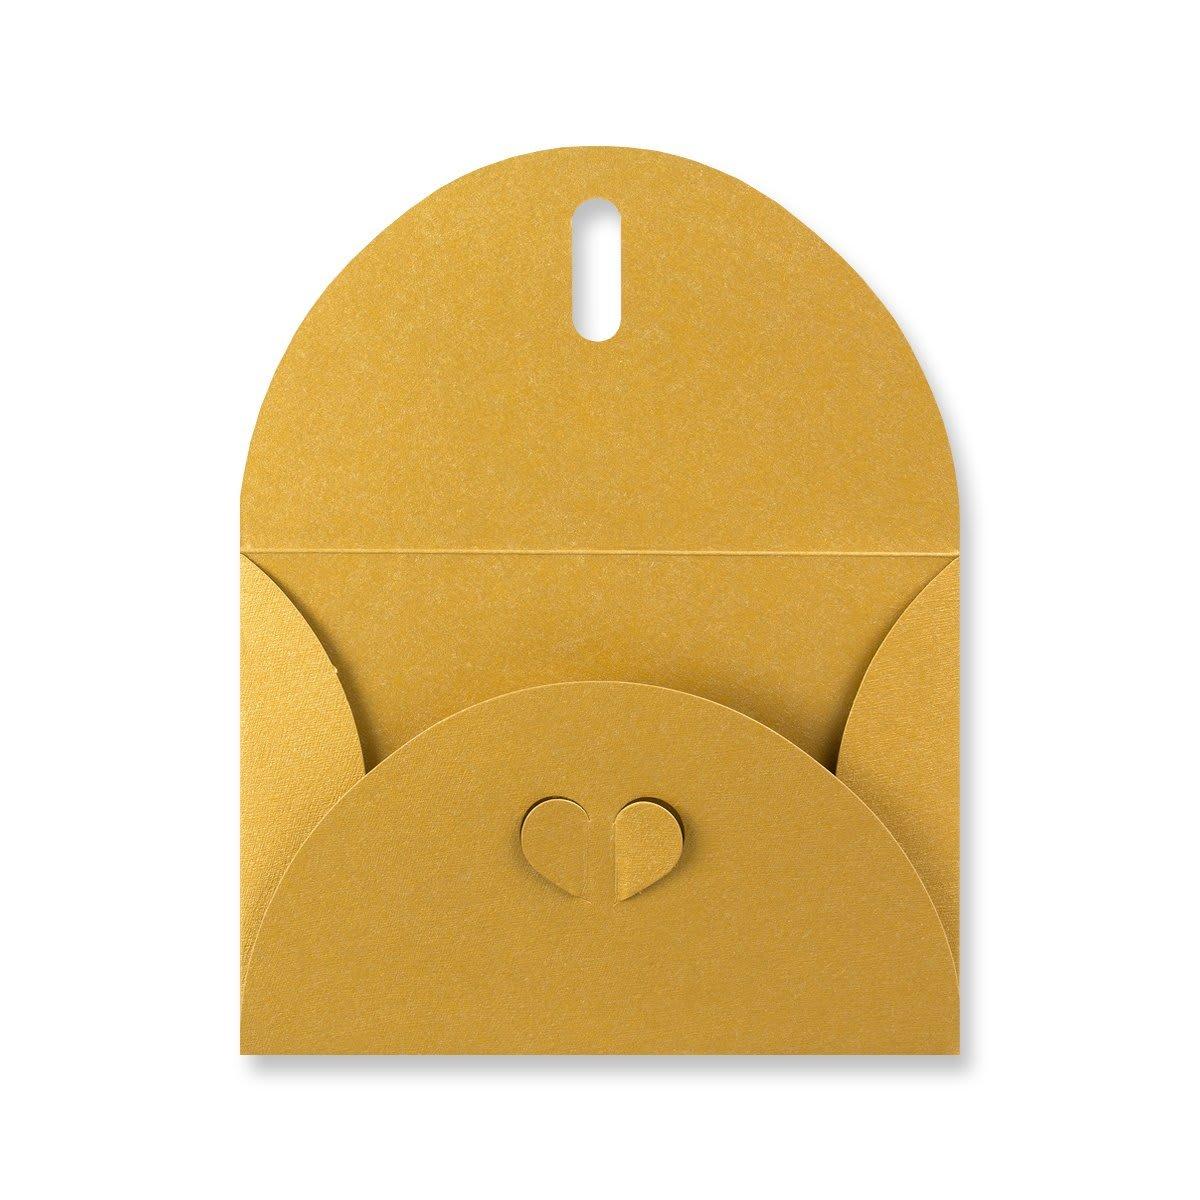 C6 GOLD BUTTERFLY ENVELOPES